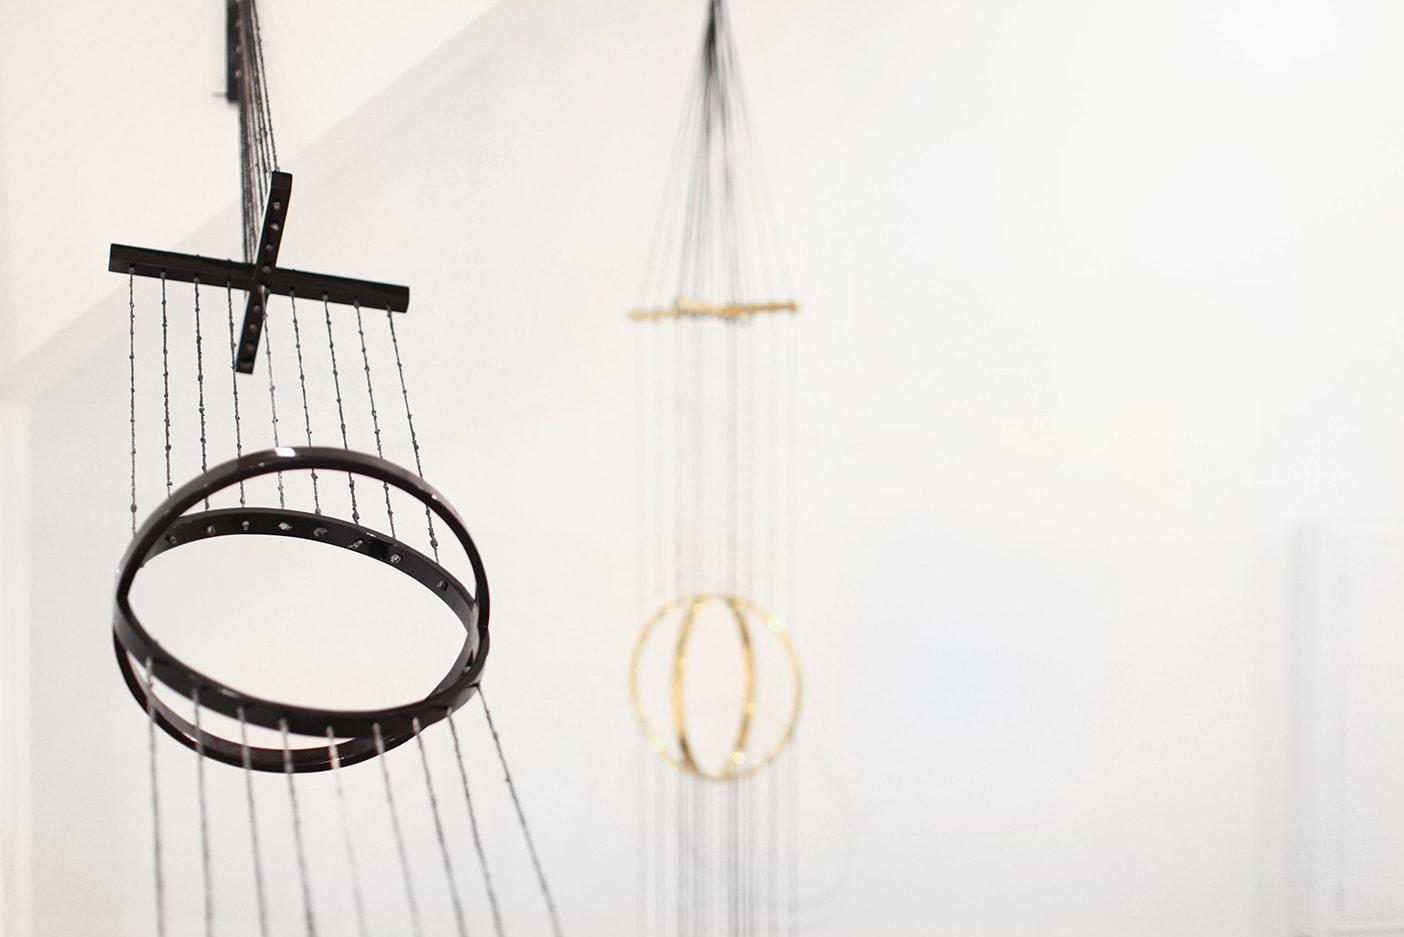 12 Installation Steven Pestana Geometer at GRIN-min.jpg